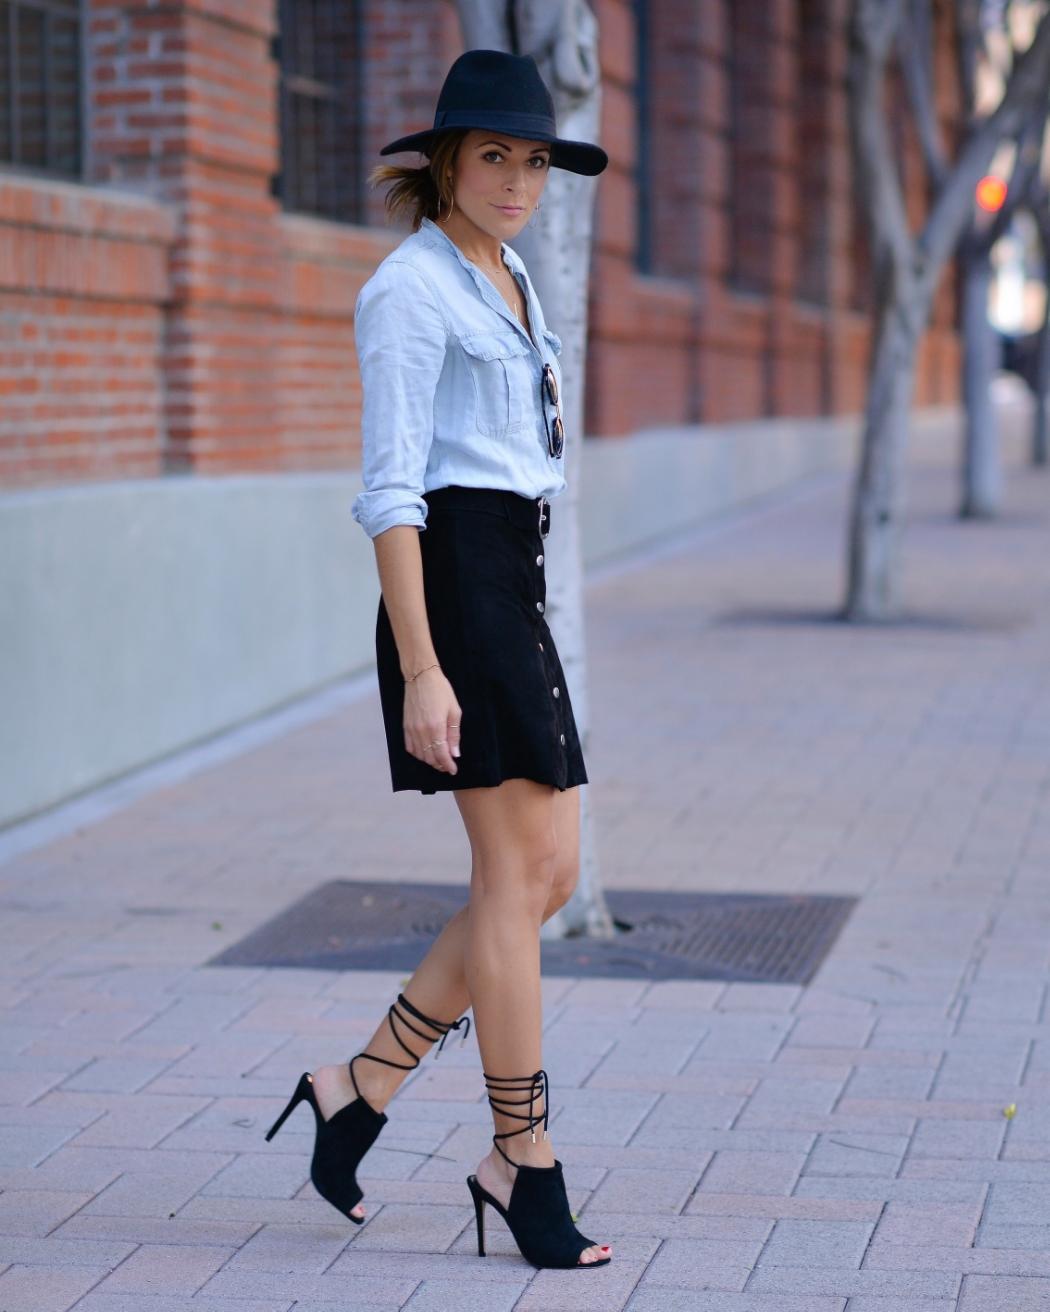 Zara_Suedeskirt_Streetfashion_Streetstyle_Madewell_SteveMadden_LaceUp-Sandals_SanDiego.JPG